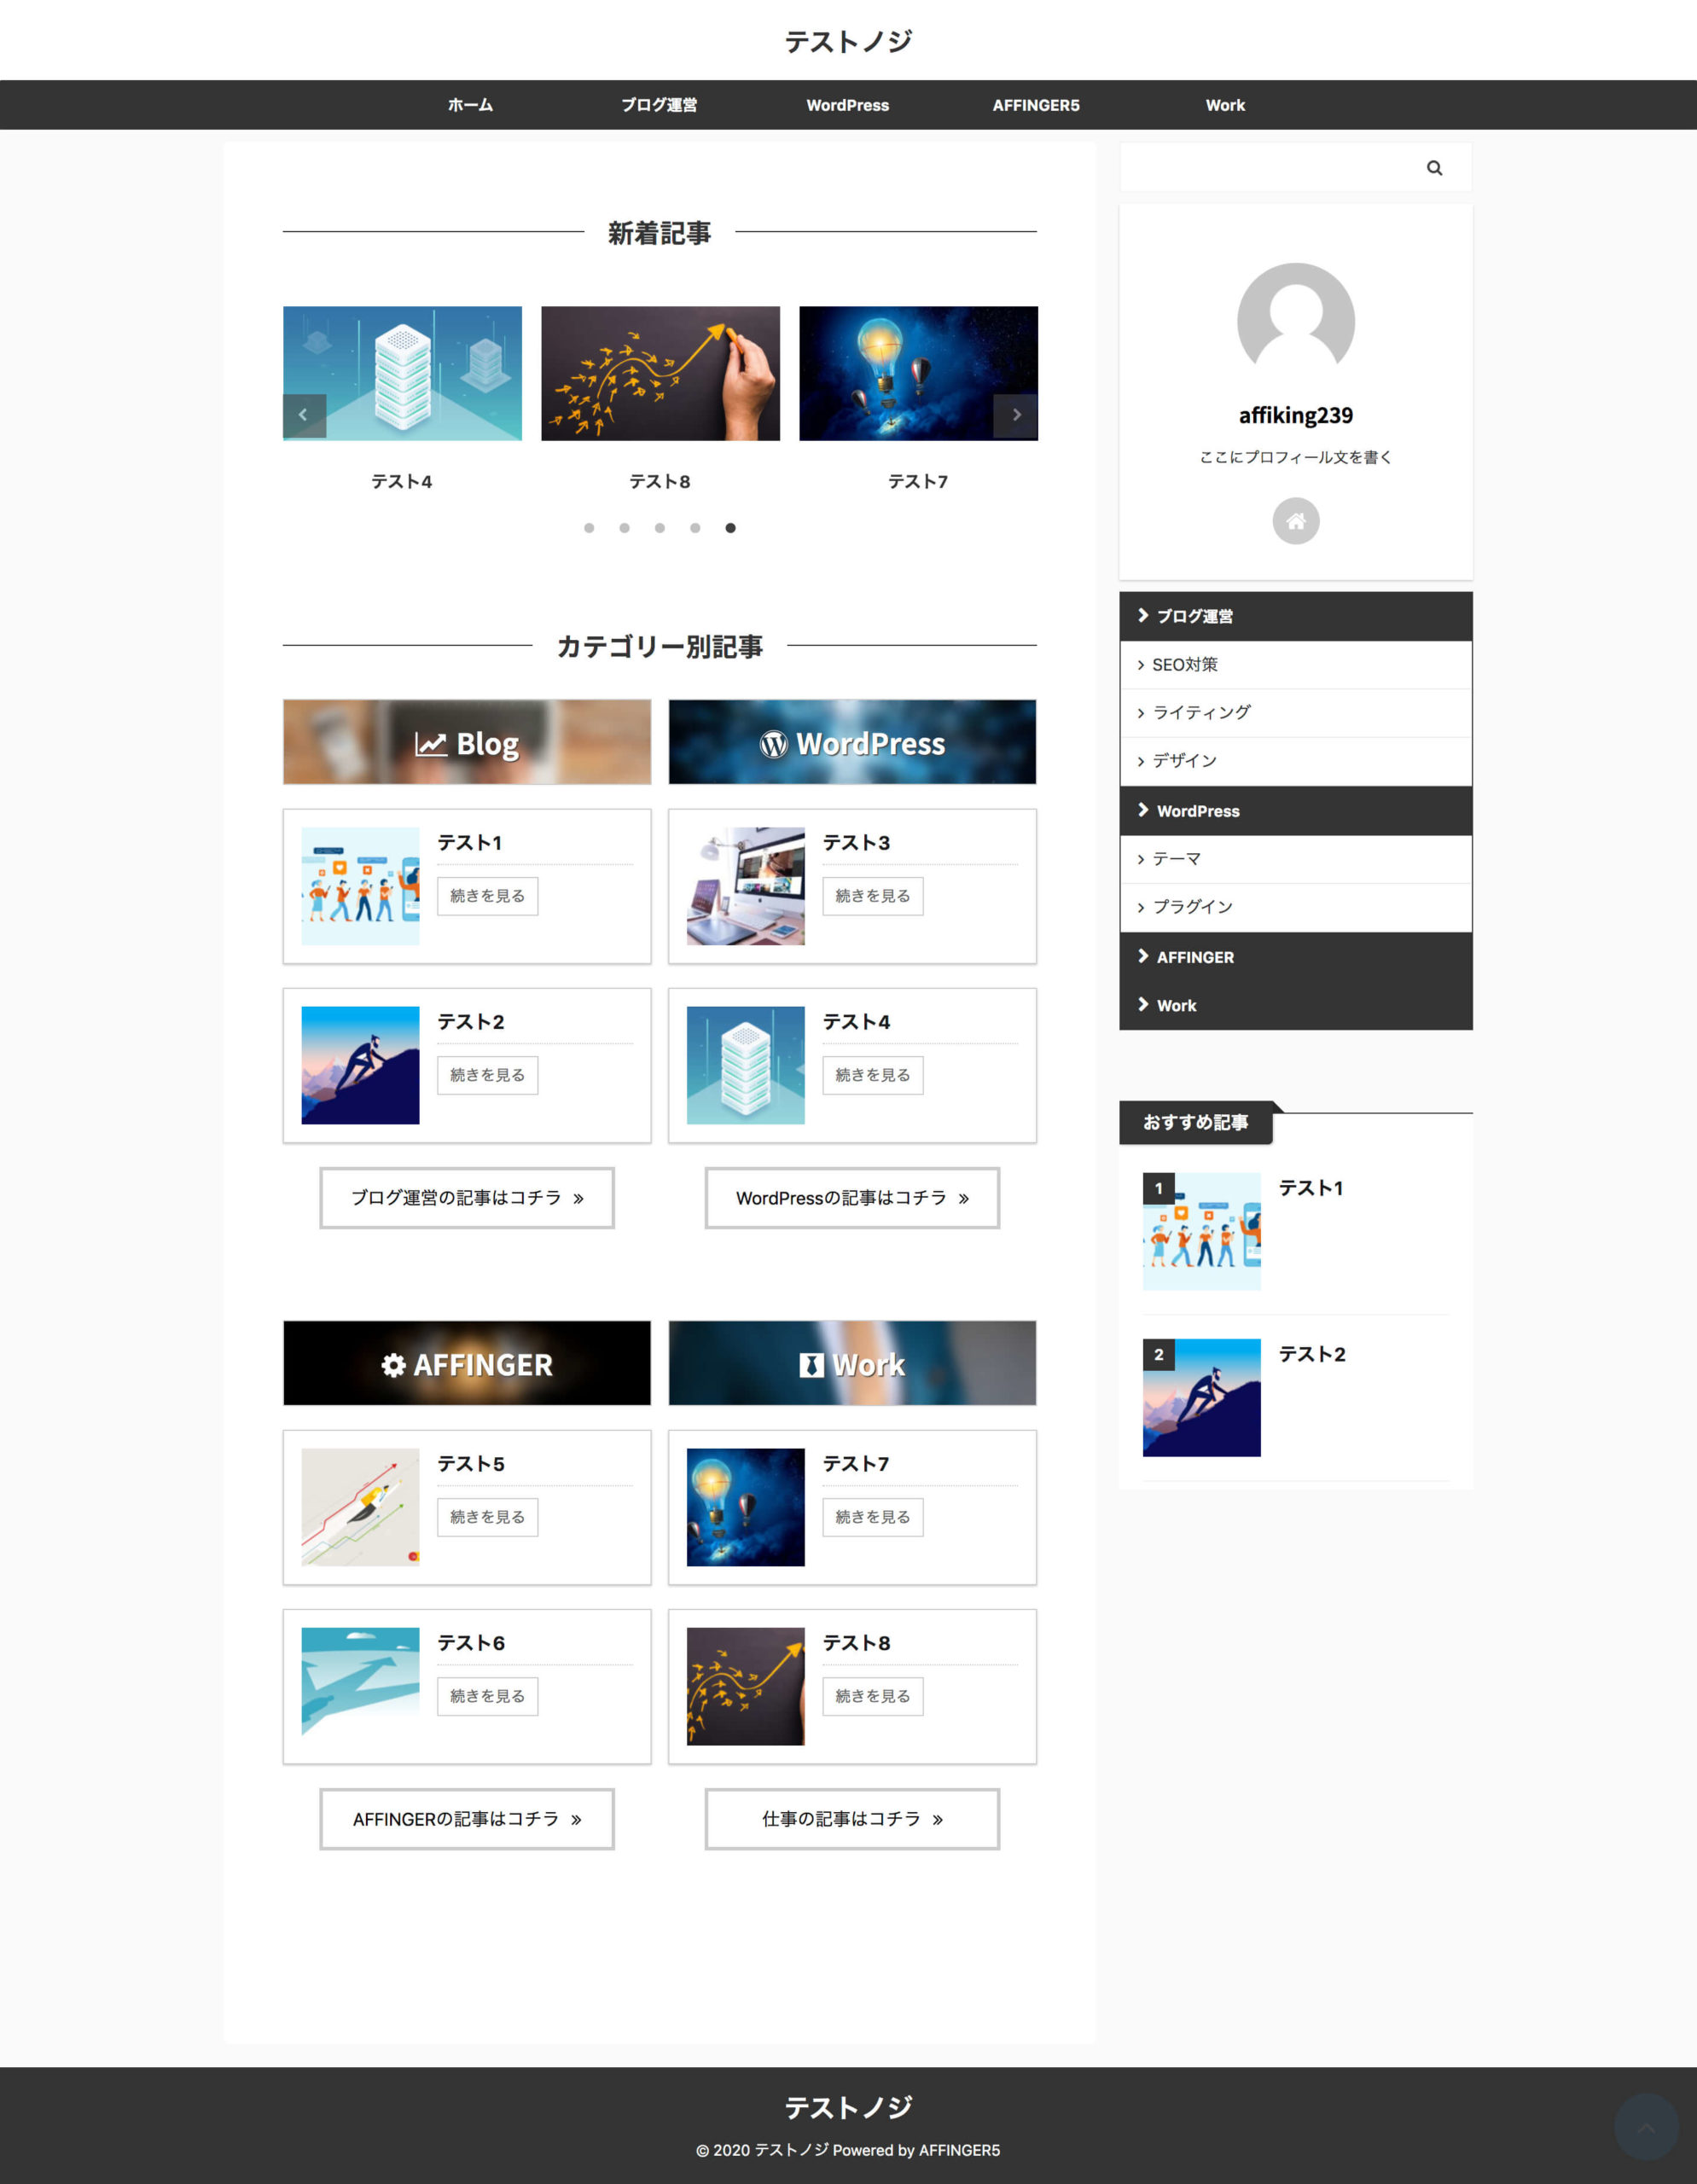 AFFINGER5(アフィンガー)_トップページカスタマイズ①